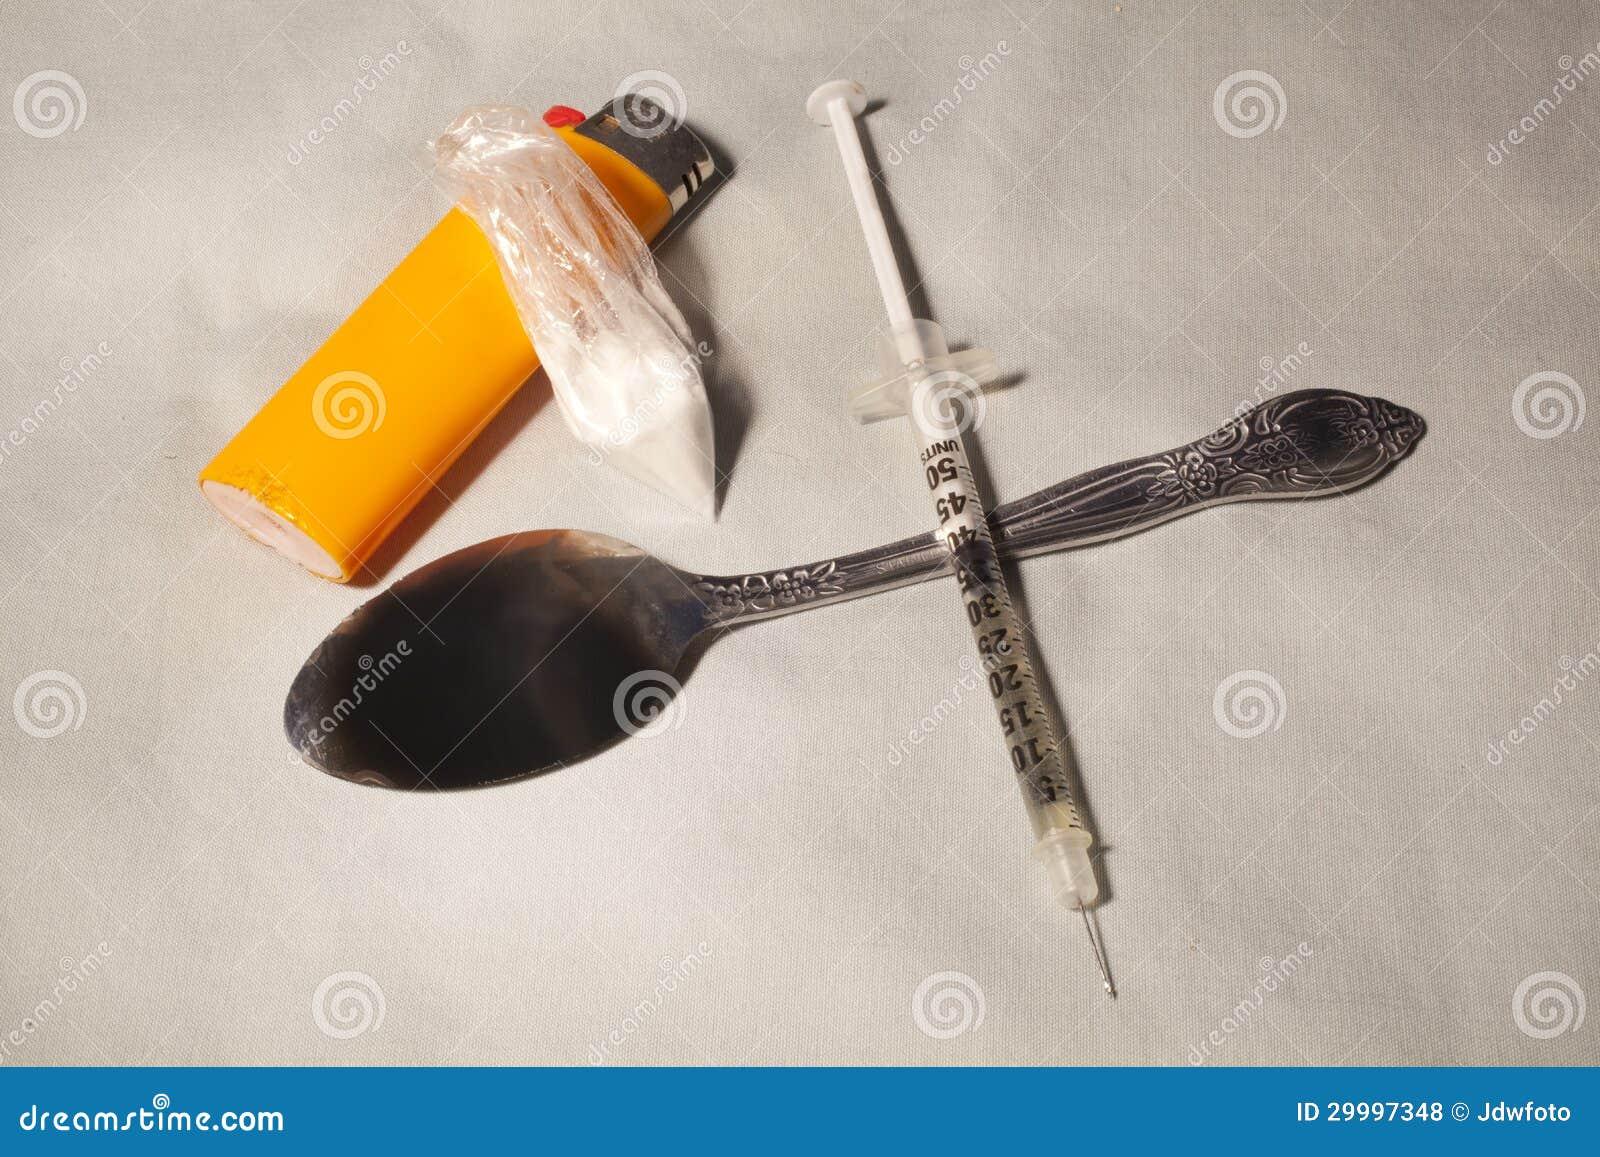 Drug Paraphernalia Royalty Free Stock Photos - Image: 29997348